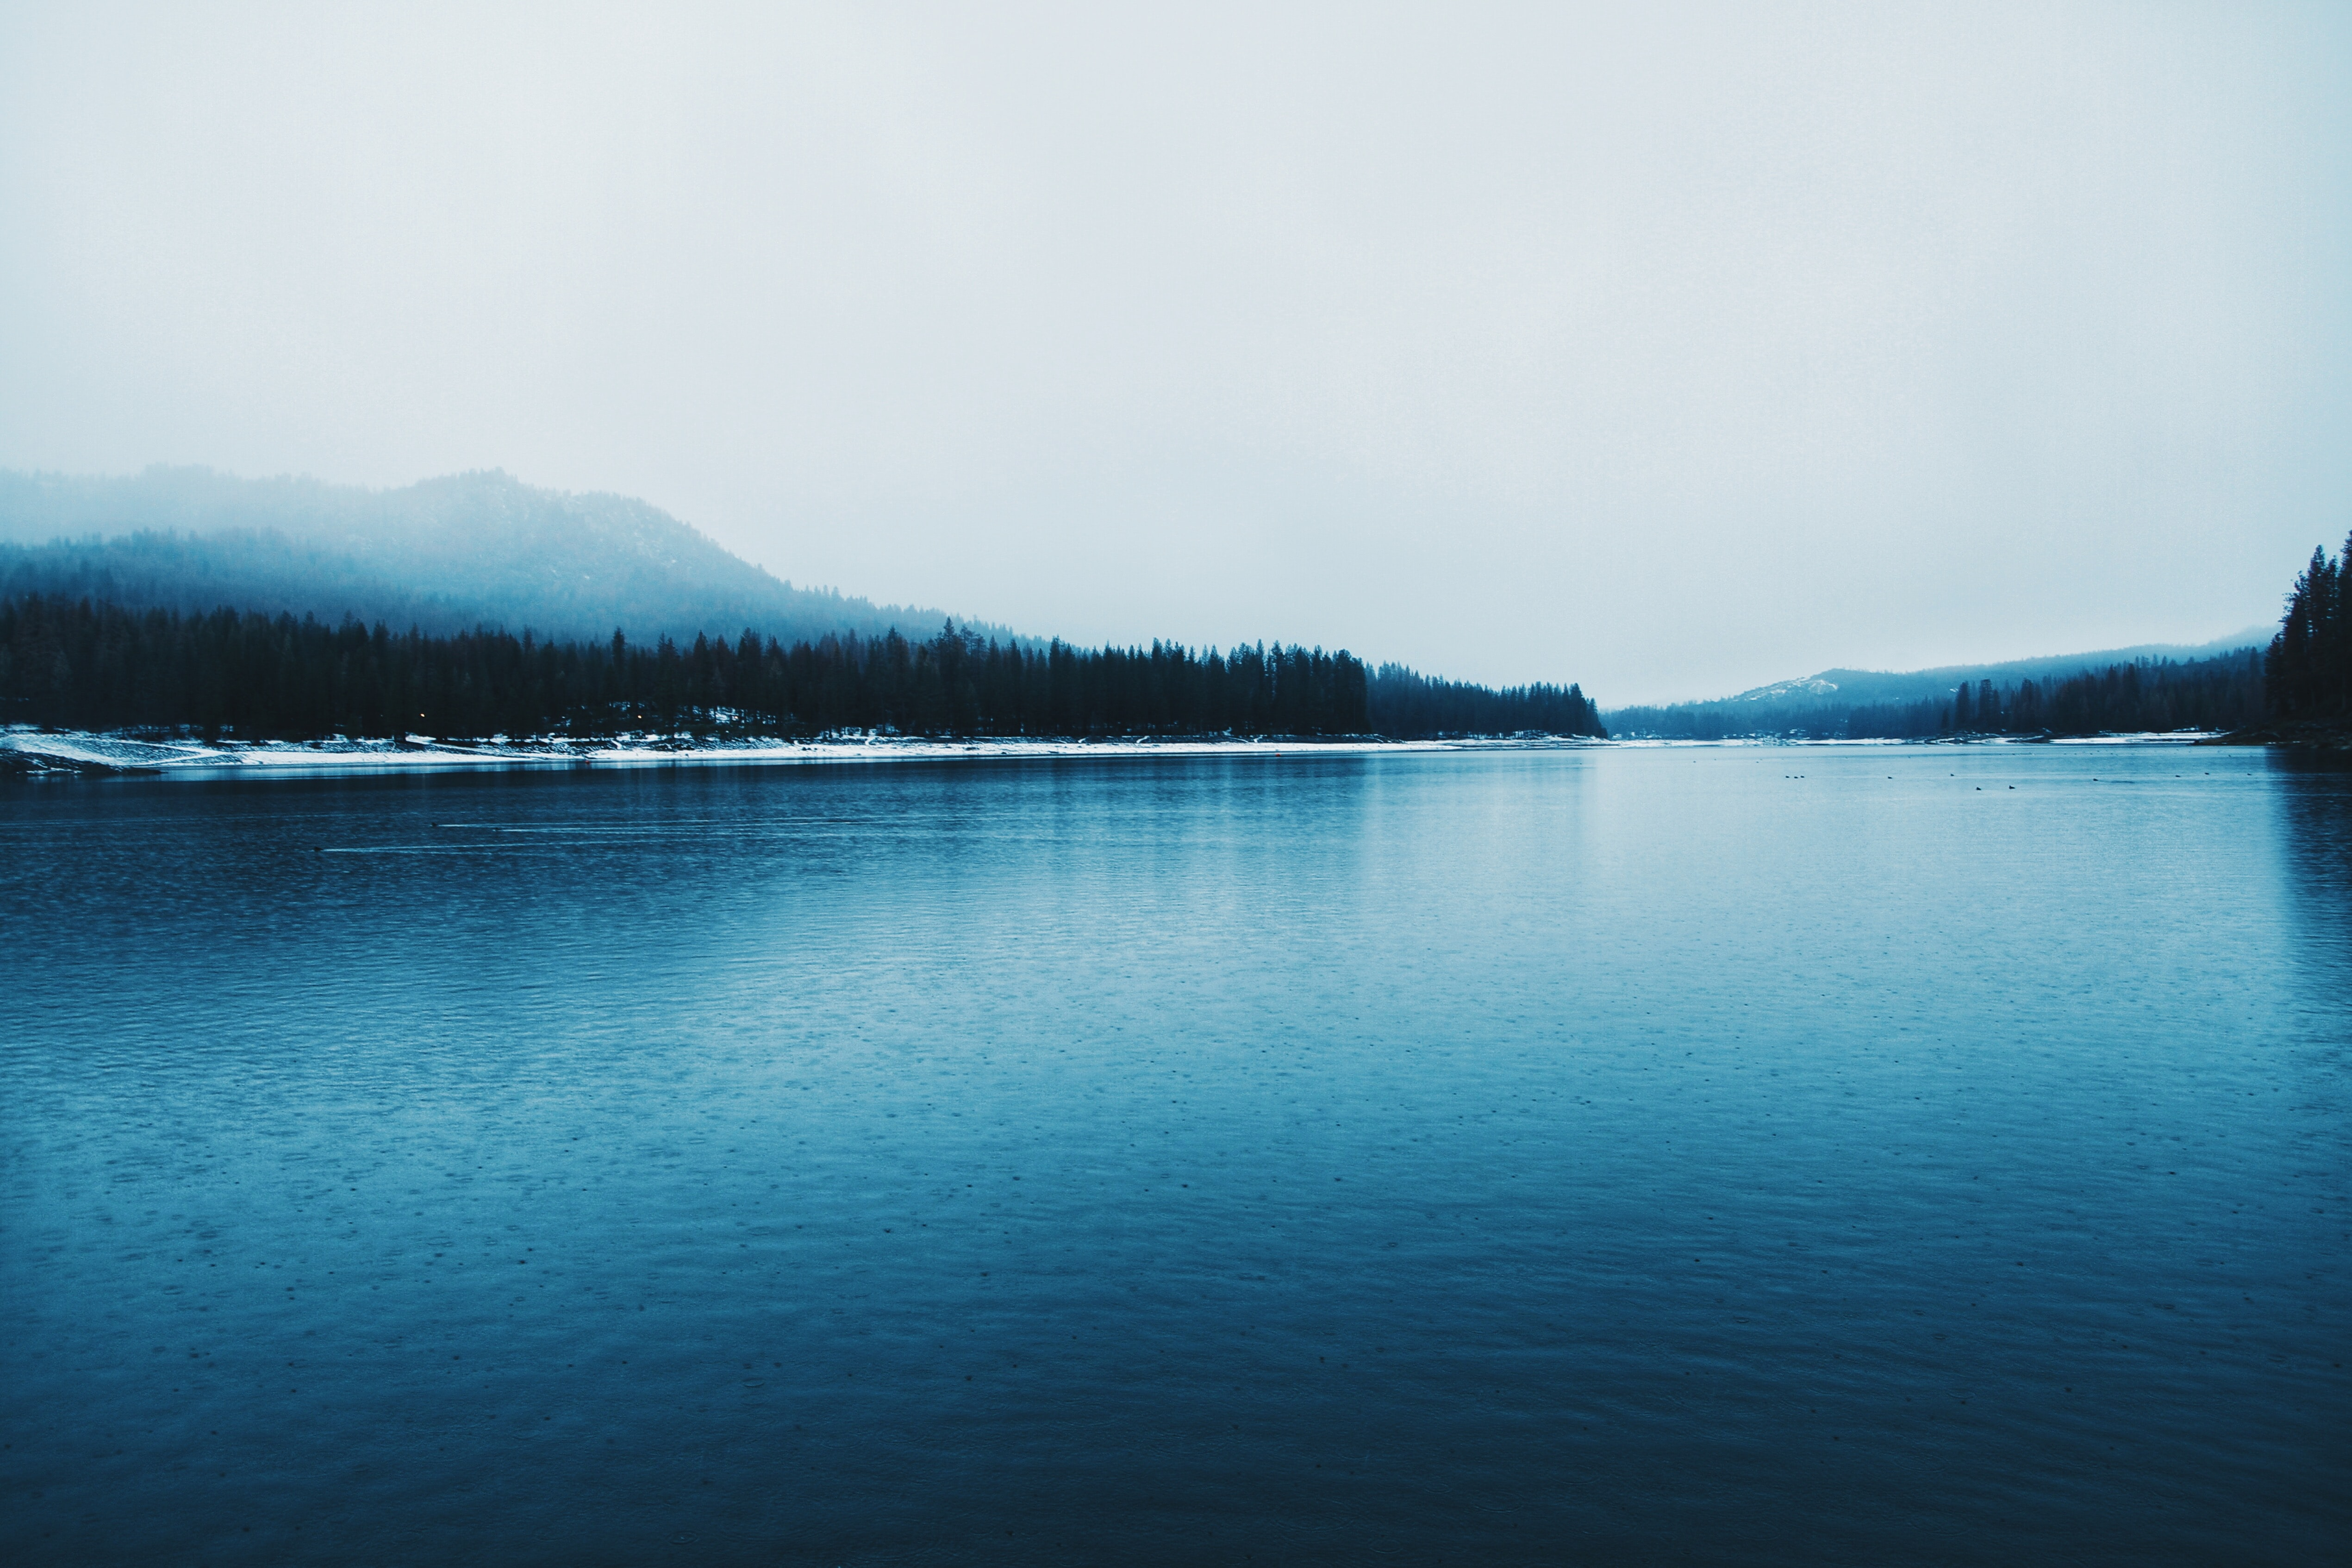 long exposure photo of body of water